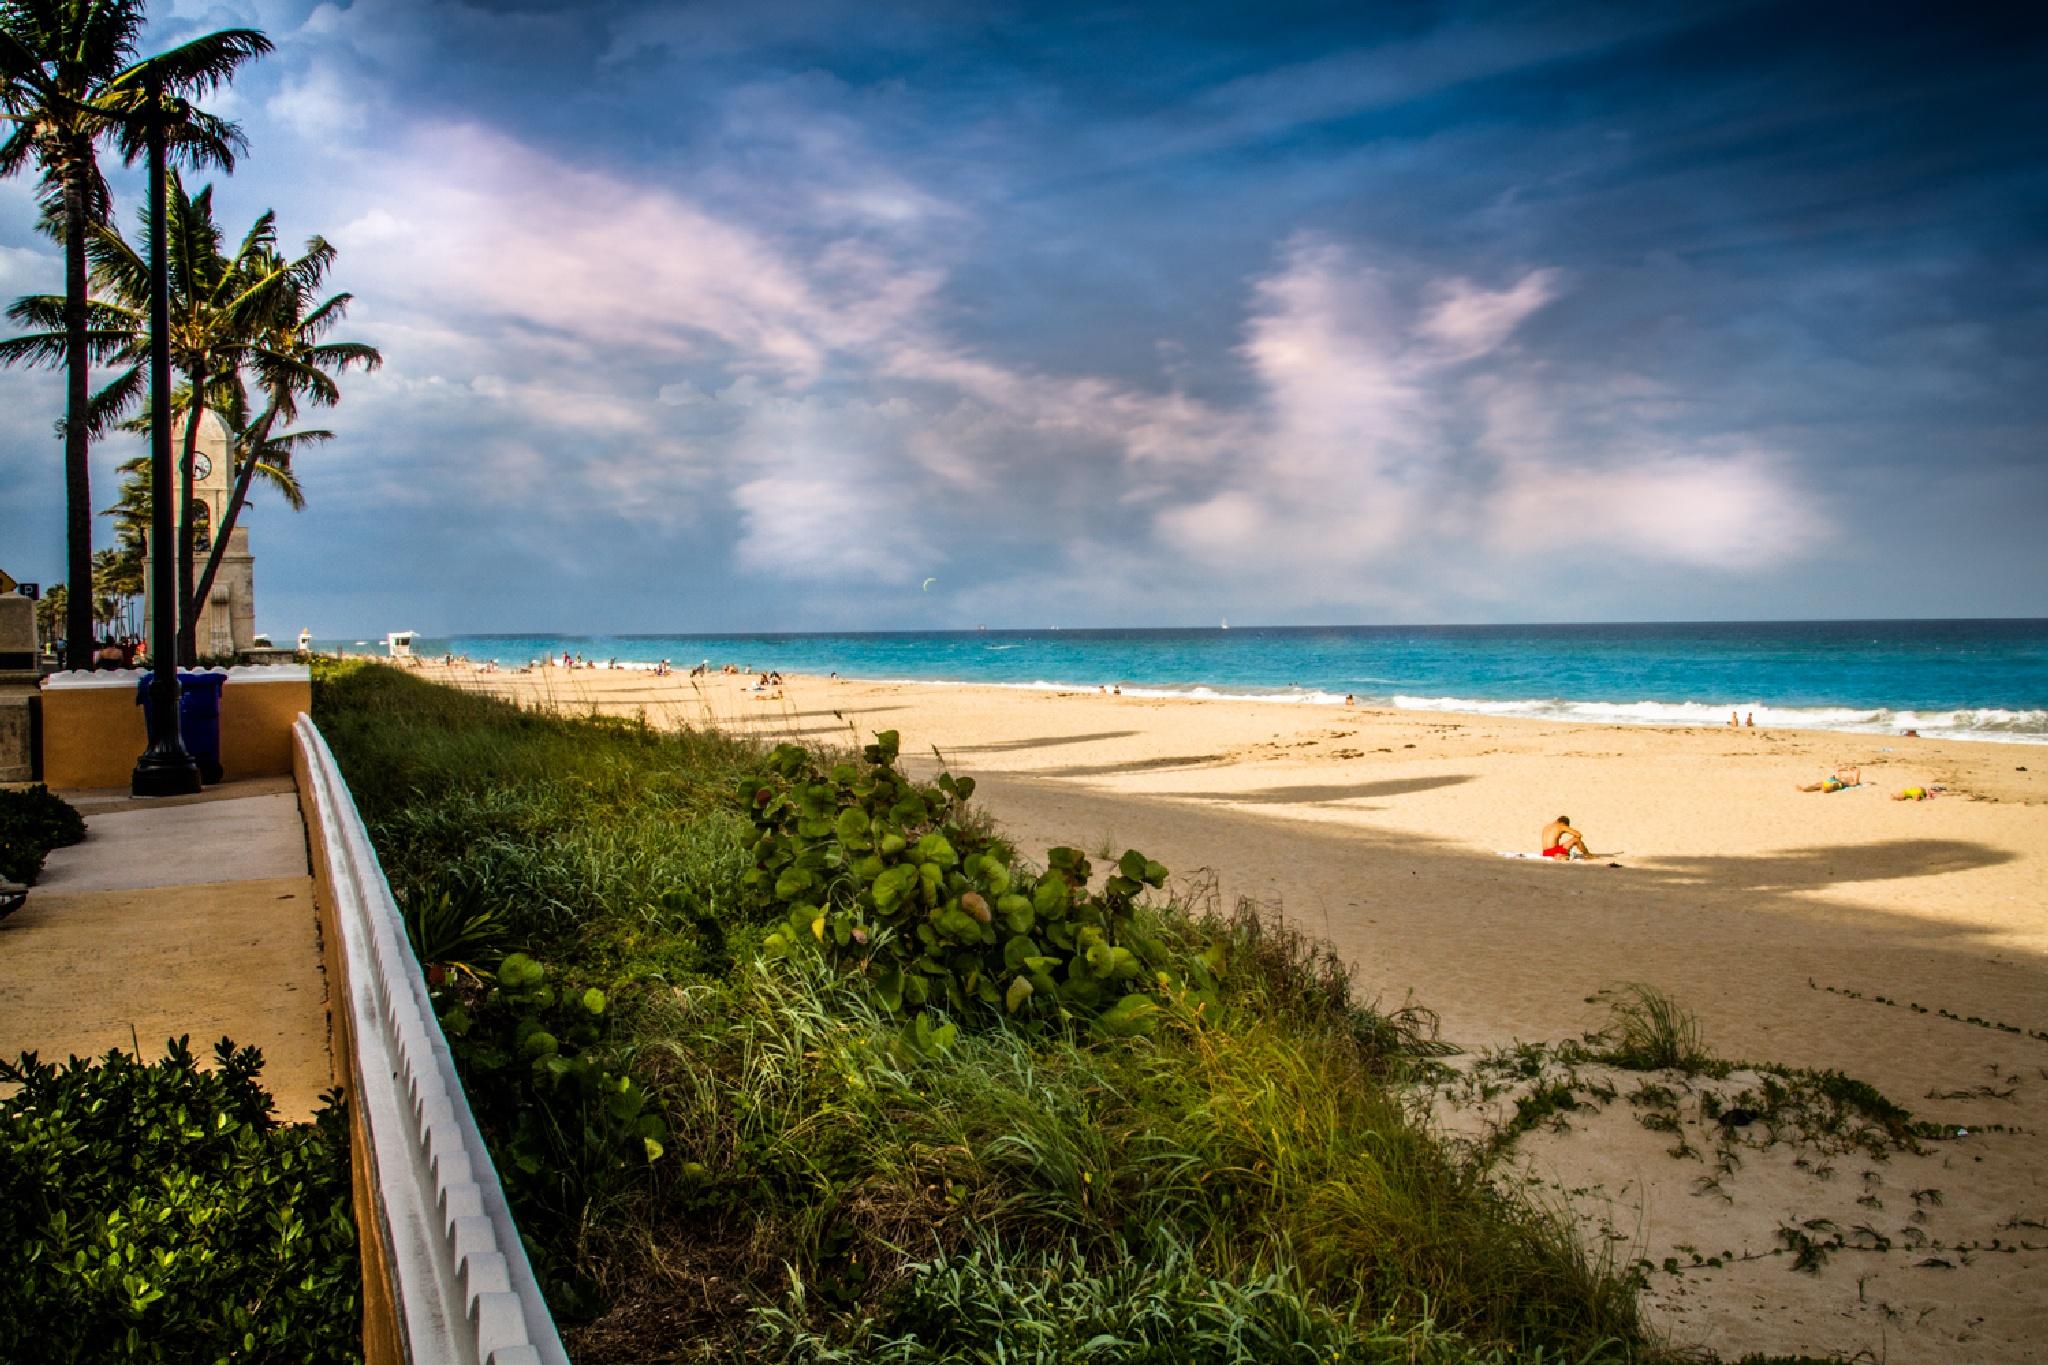 Florida Beach by Scottmcc